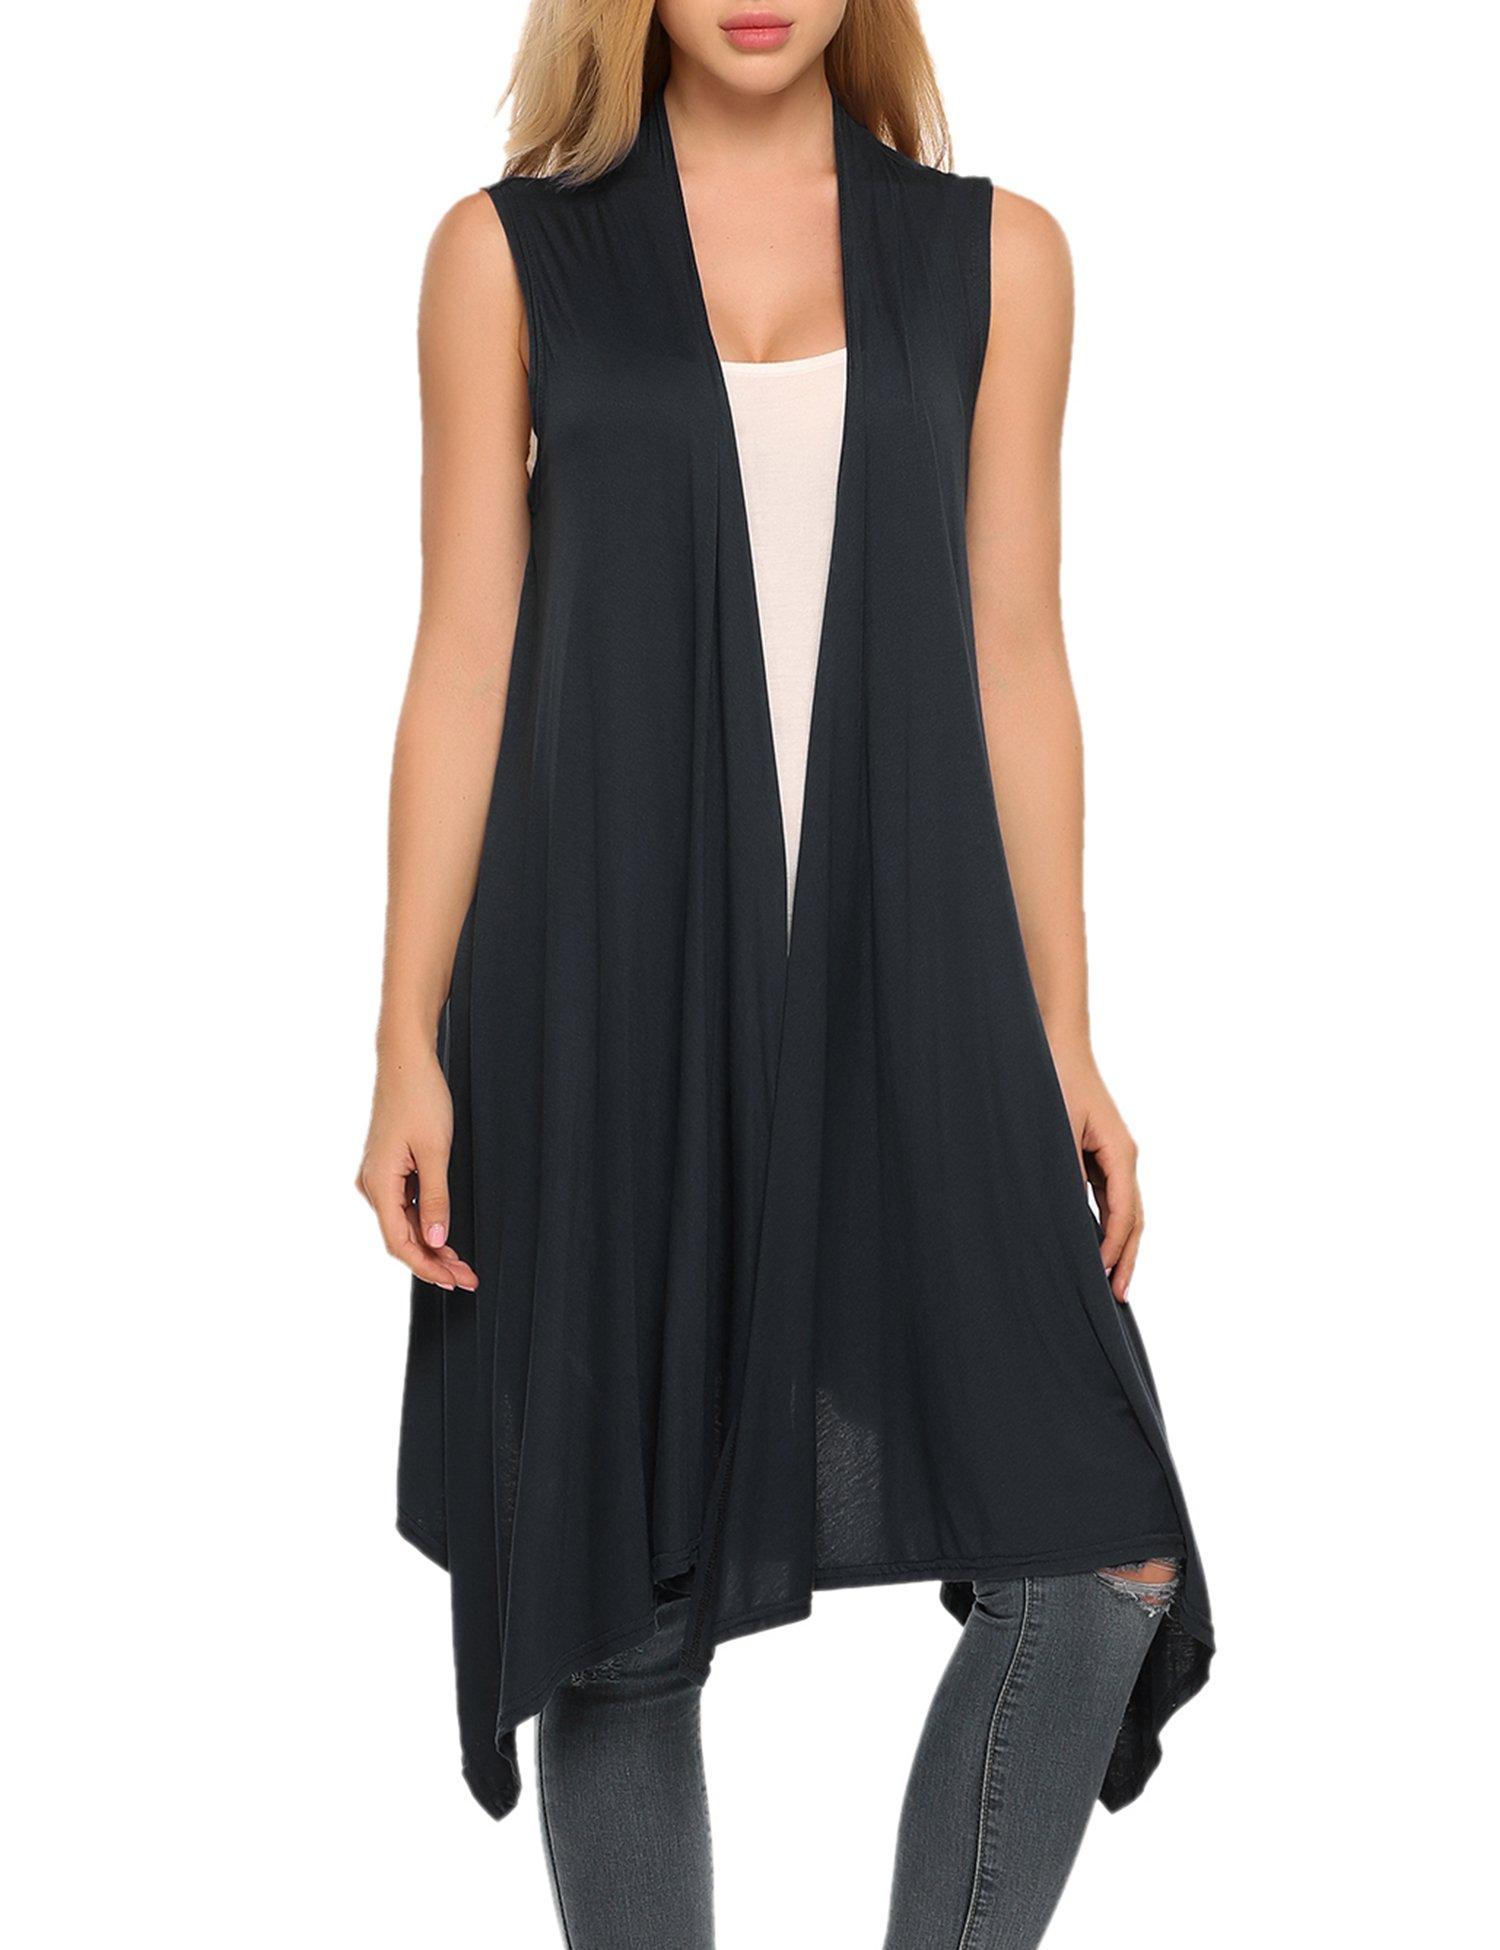 Zeagoo Women's Casual Solid Sleeveless Asymetric Hem Open Front Cardigan Top Black XL